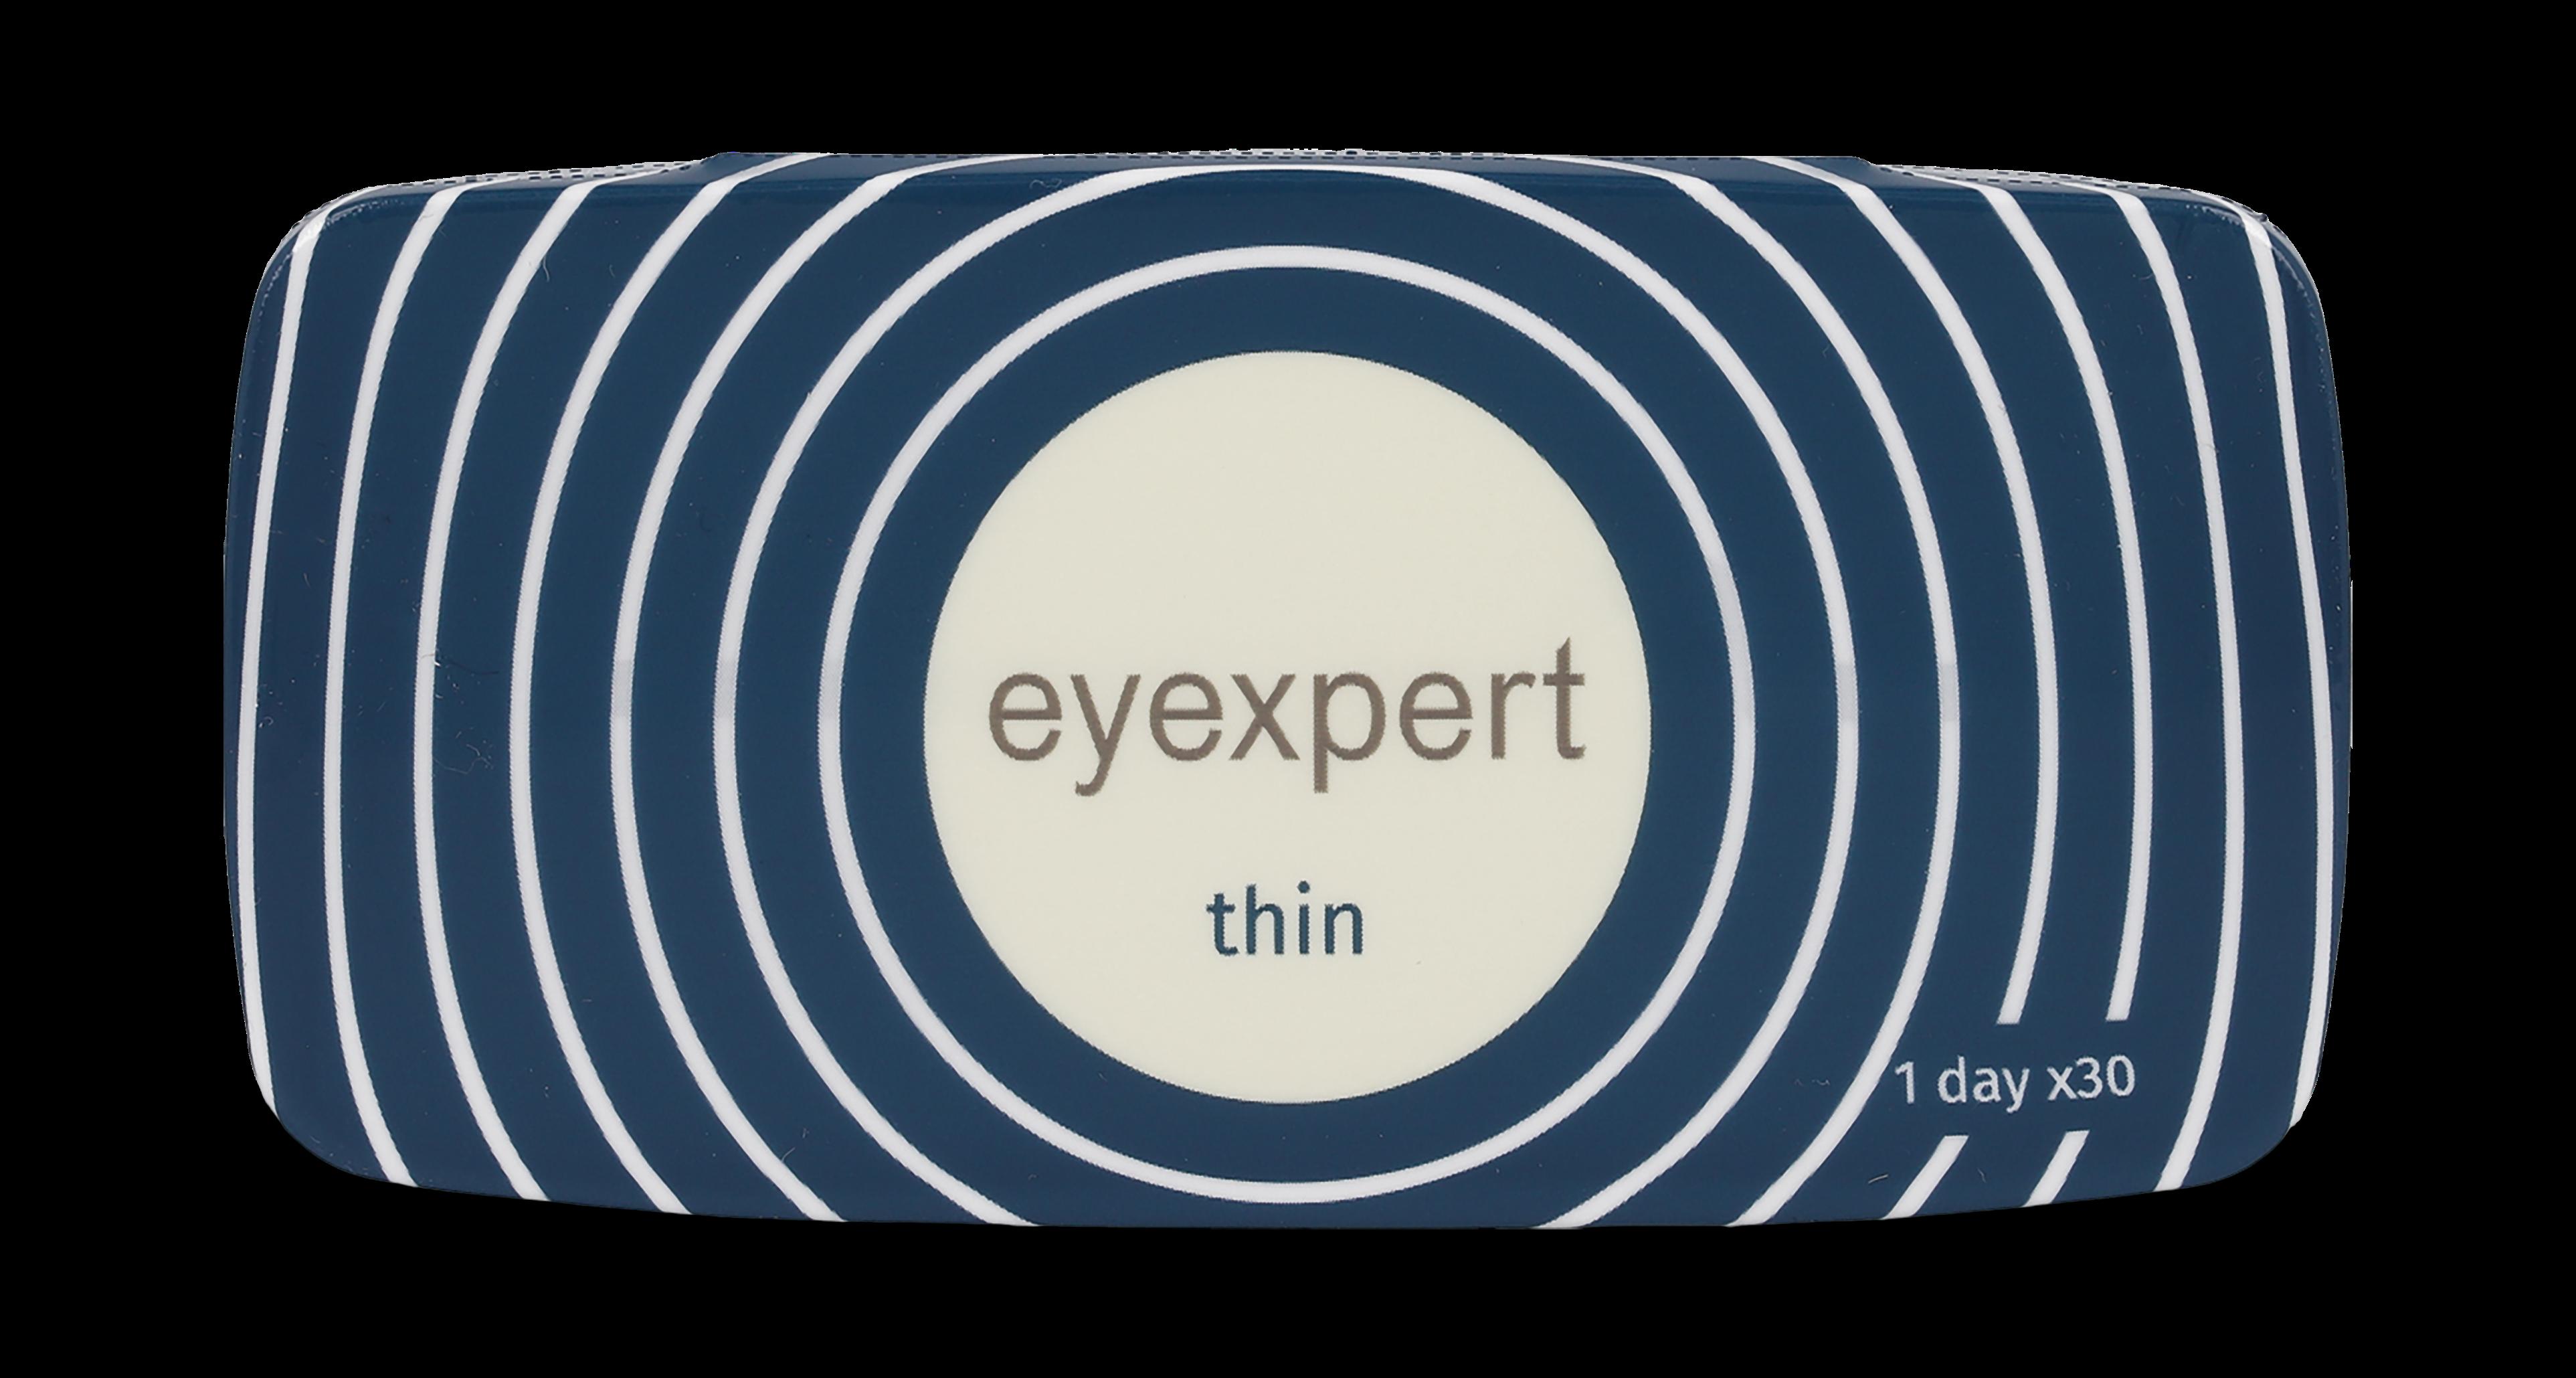 Front Eyexpert Thin